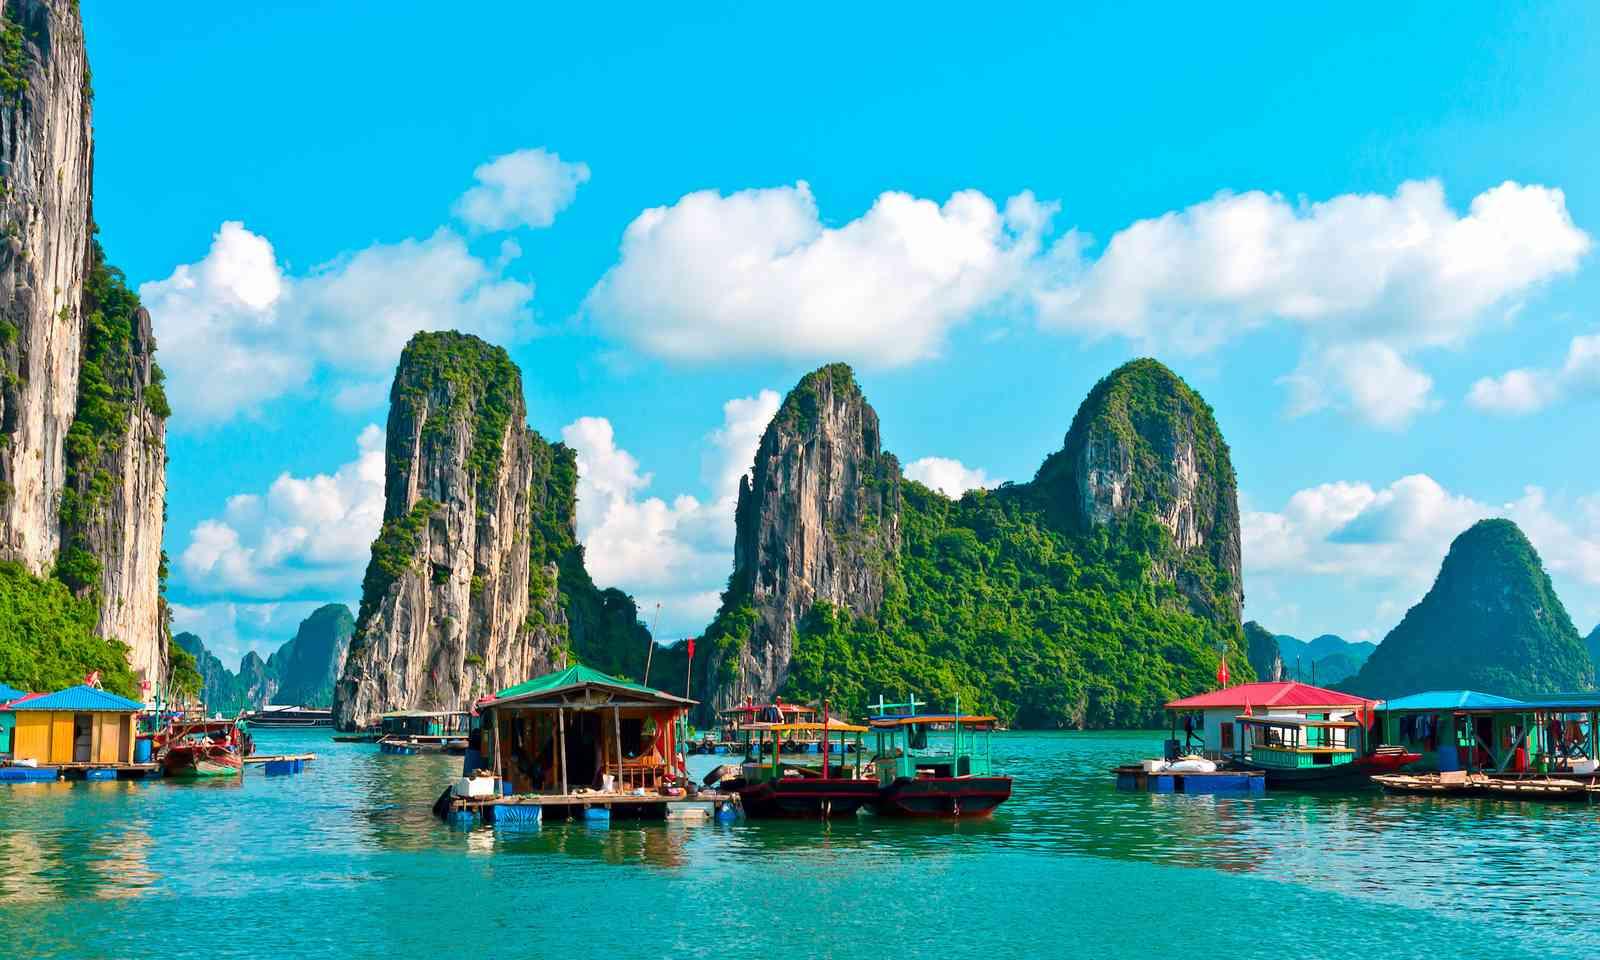 Floating village in Halong Bay (Shutterstock.com)